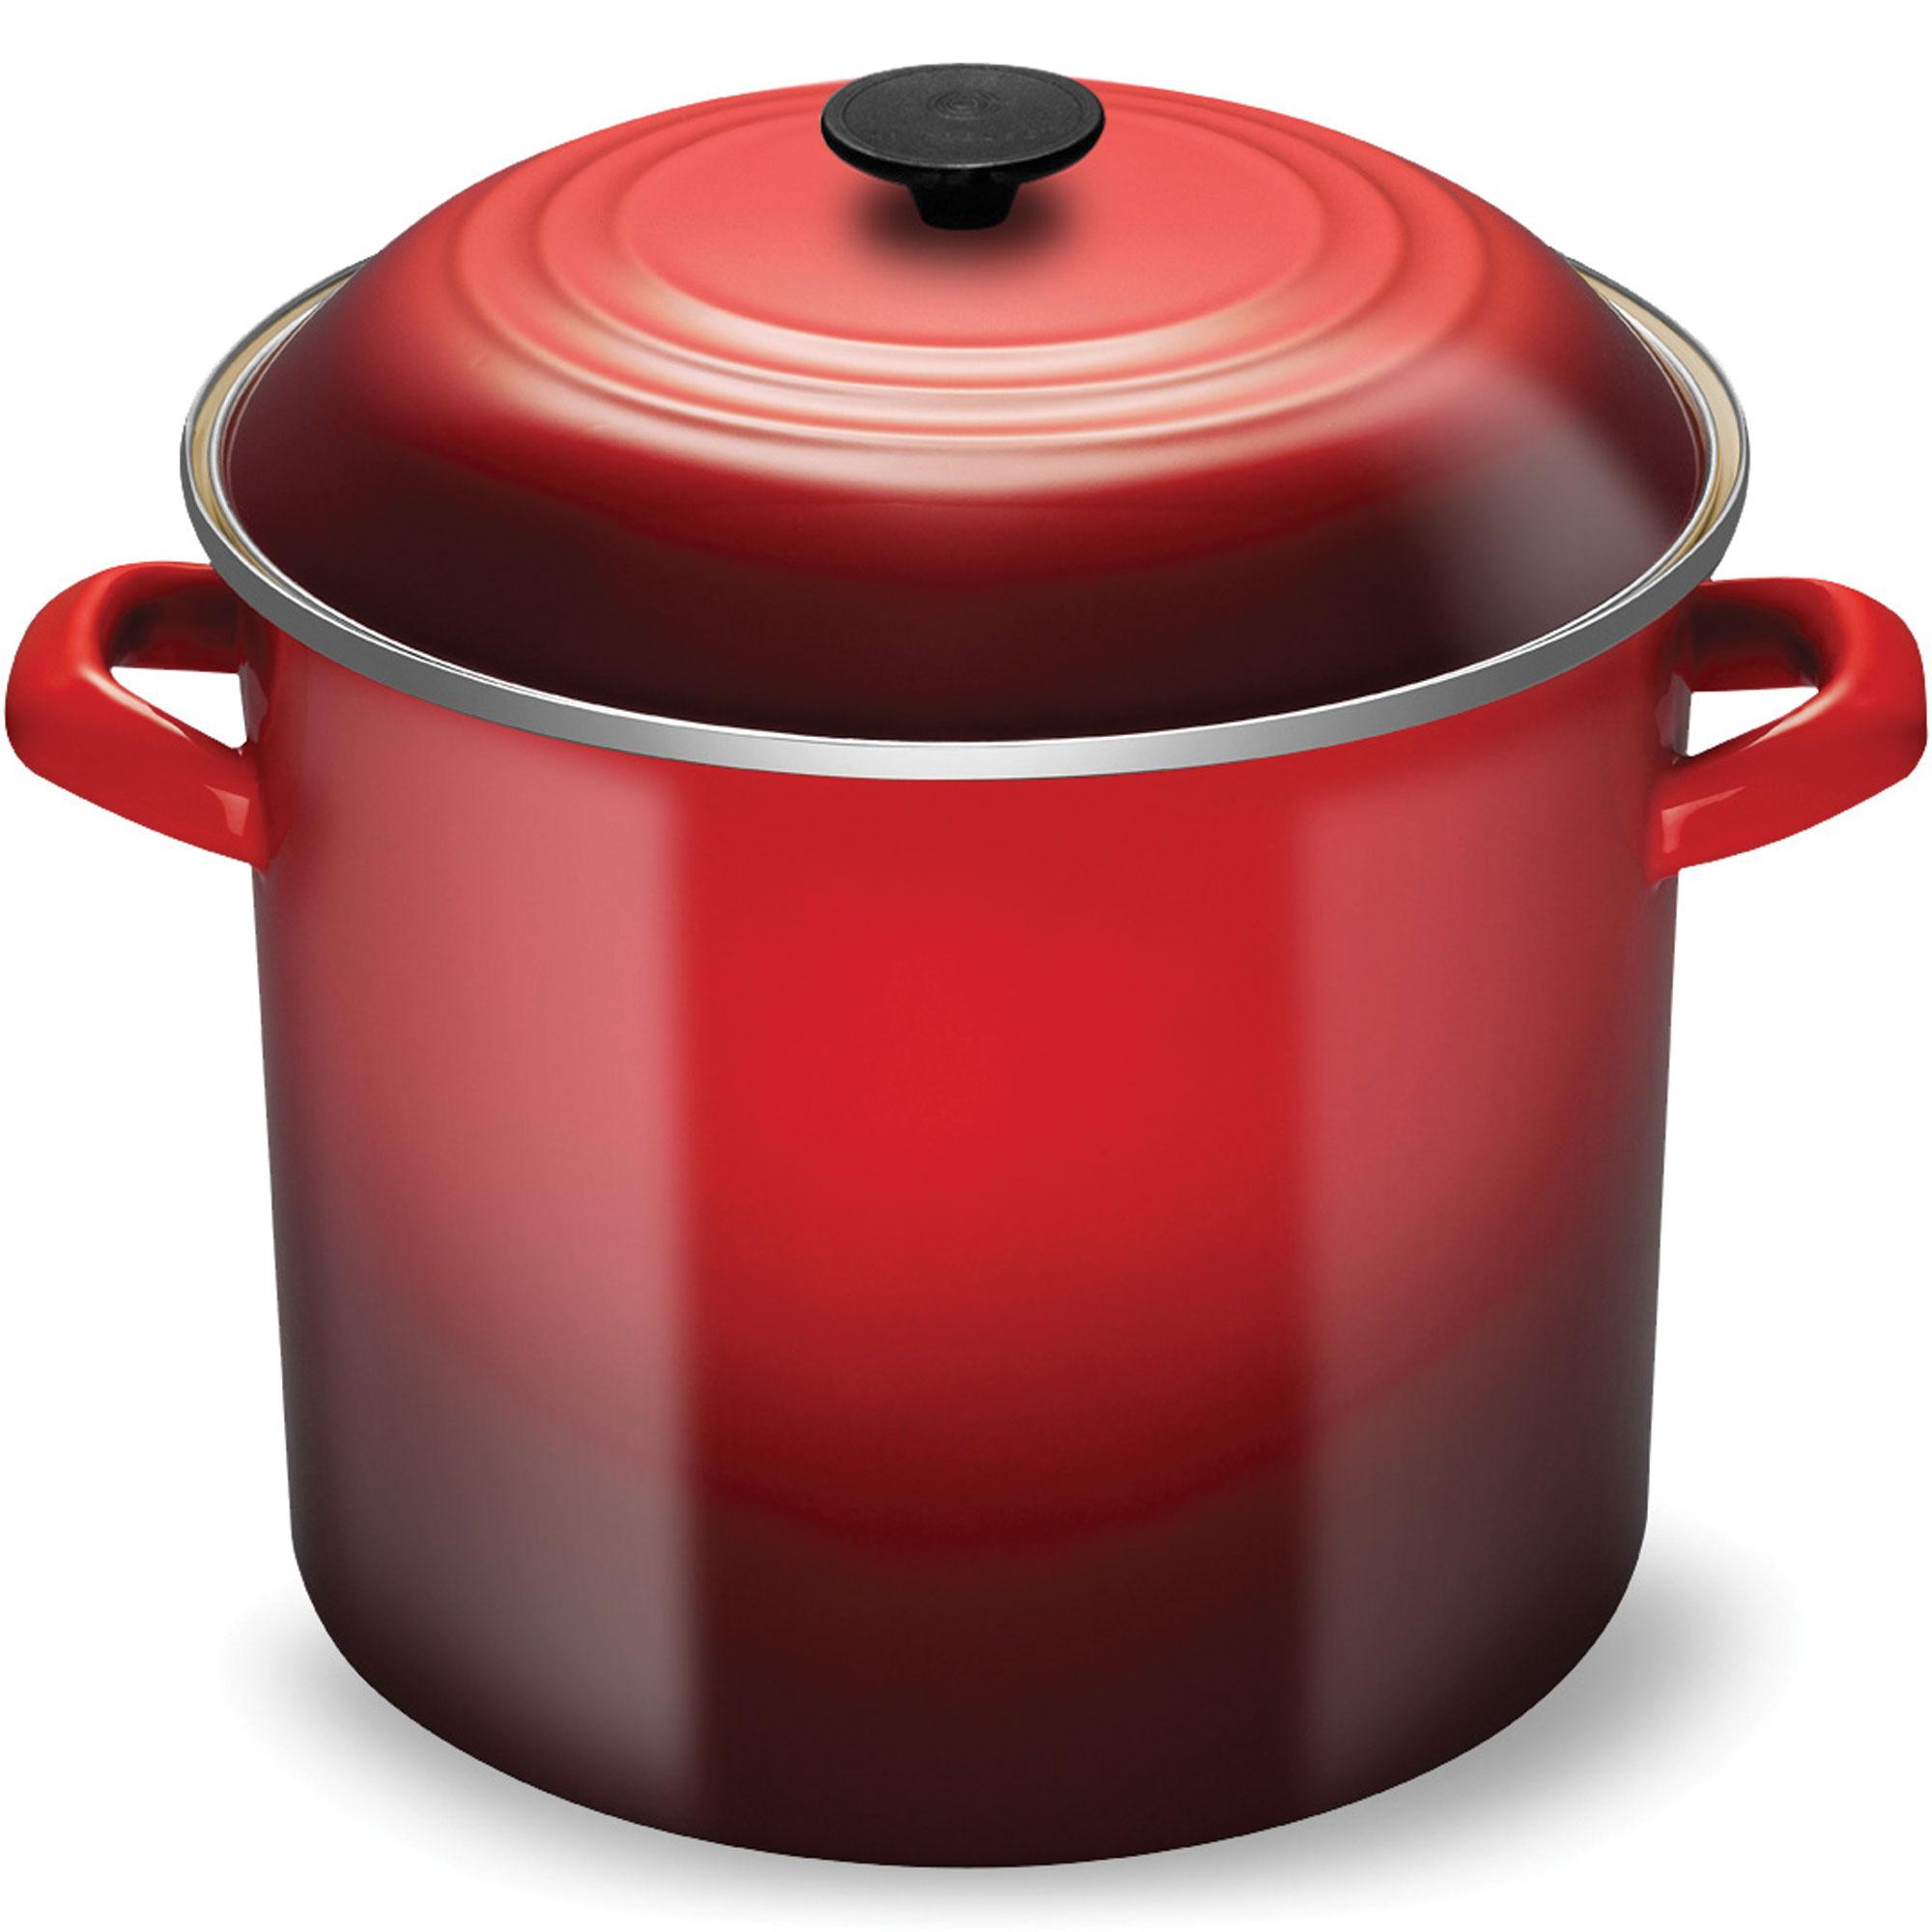 Le Creuset Enameled Steel Stock Pot 16 Quart Cherry Red